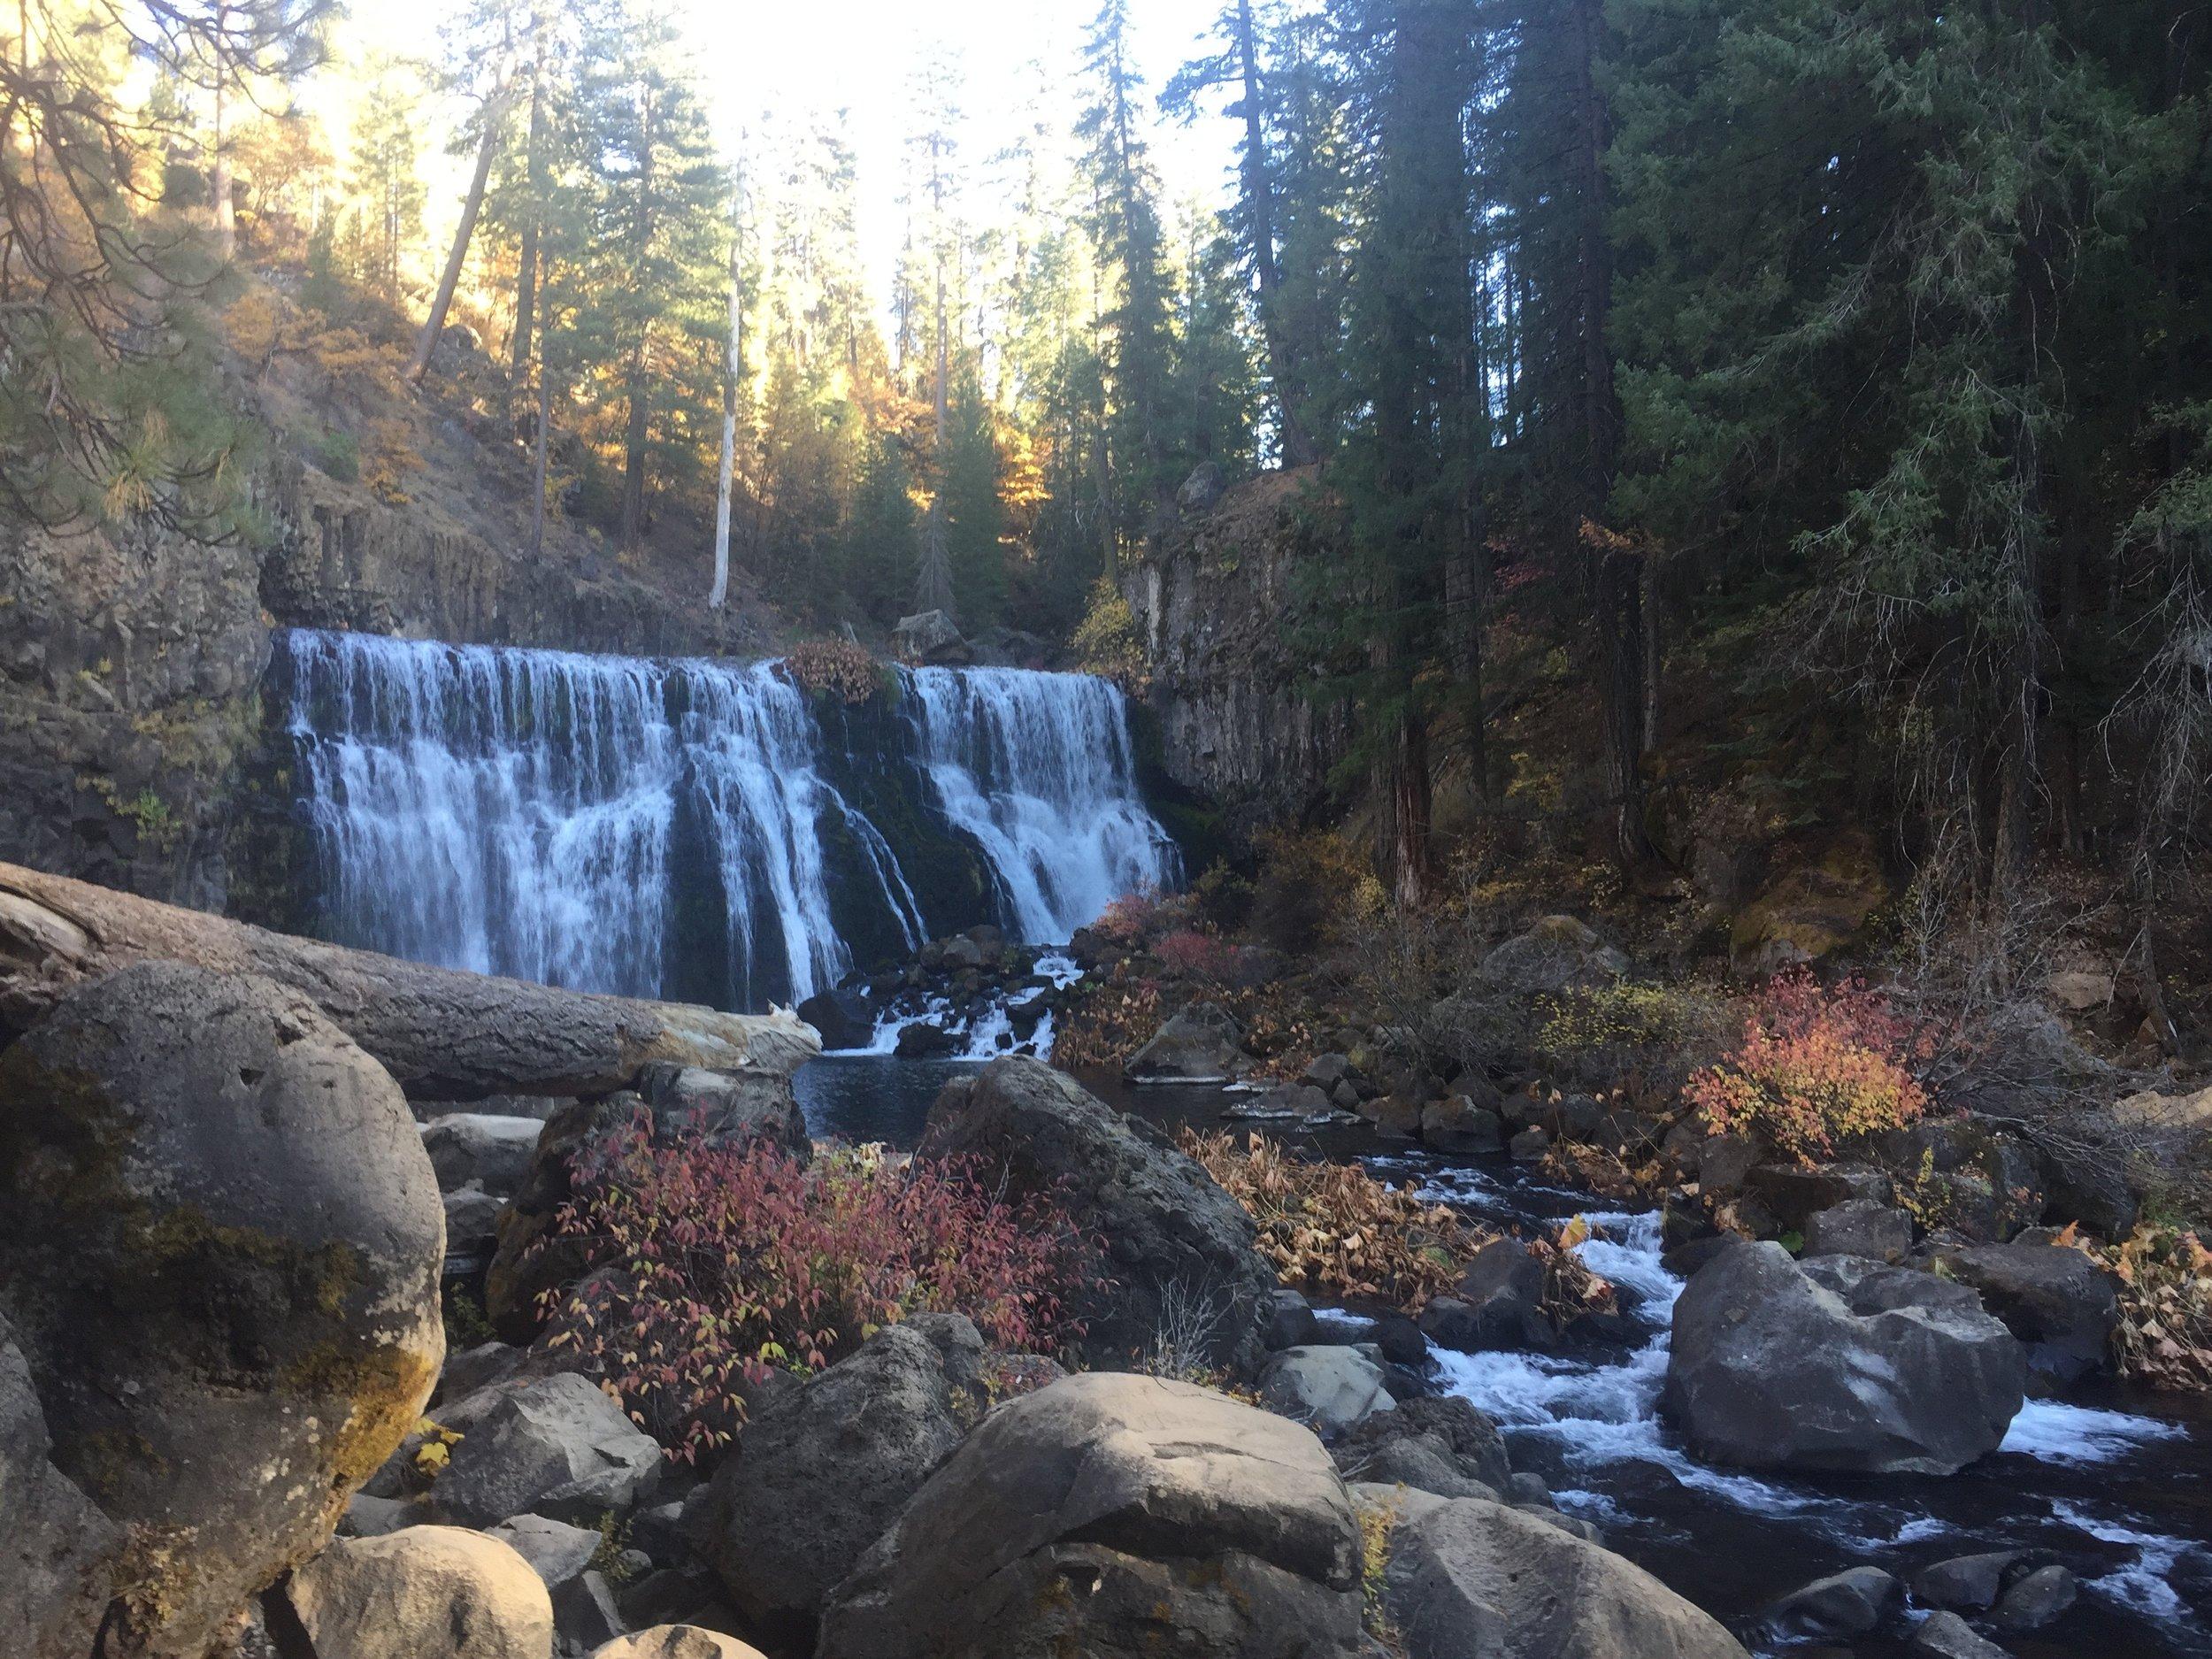 McCloud Falls Middle Falls